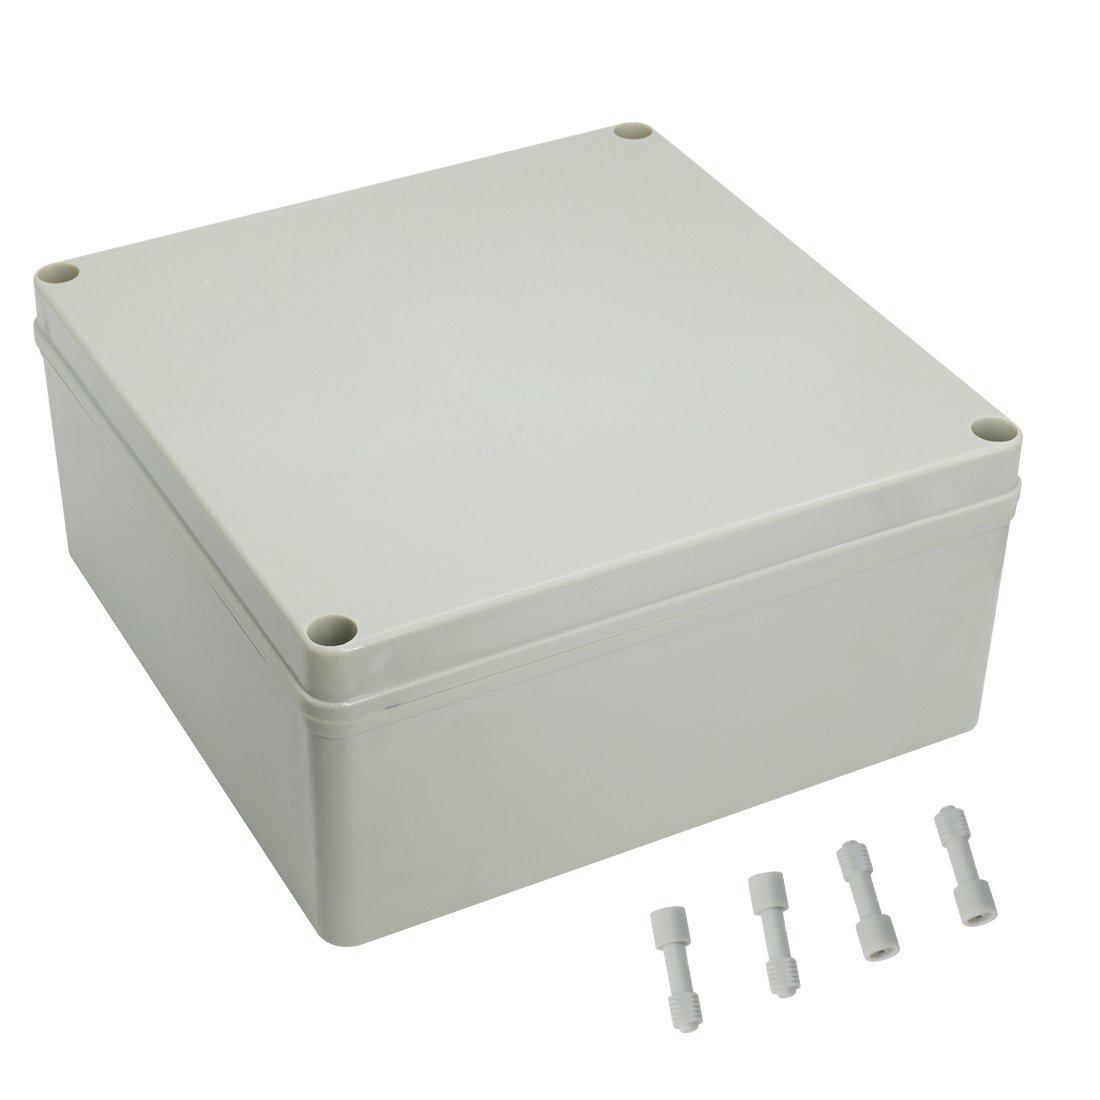 LeMotech 7.9 x 7.9 x 3.7 200mm x 200mm x 95mm Dustproof IP67 Junction Box DIY Case Enclosure Gray